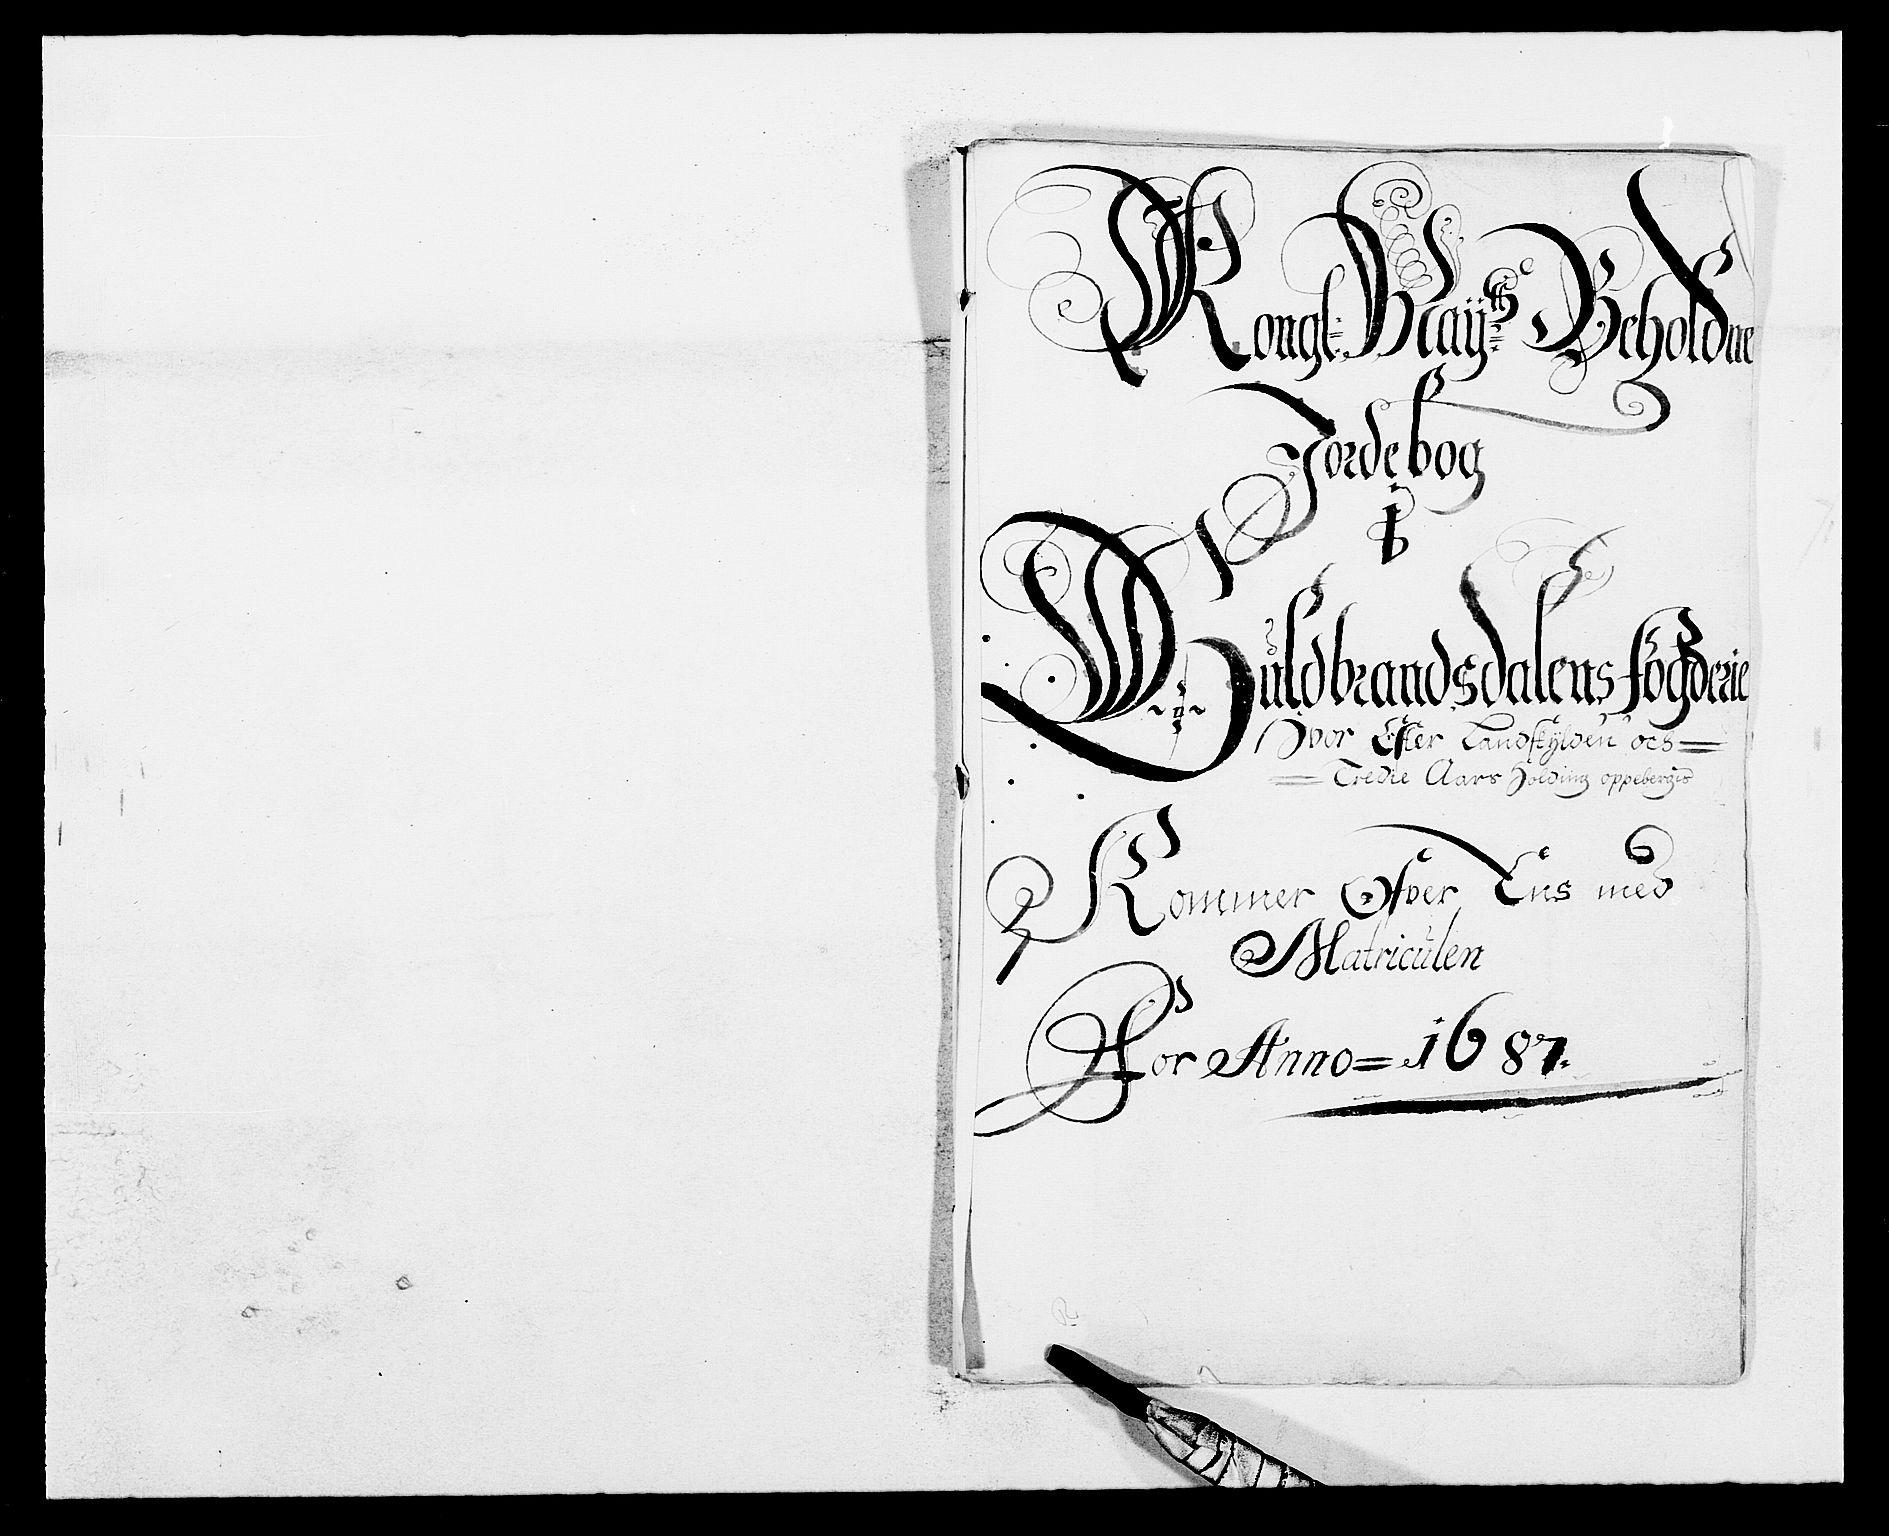 RA, Rentekammeret inntil 1814, Reviderte regnskaper, Fogderegnskap, R17/L1162: Fogderegnskap Gudbrandsdal, 1682-1689, s. 32